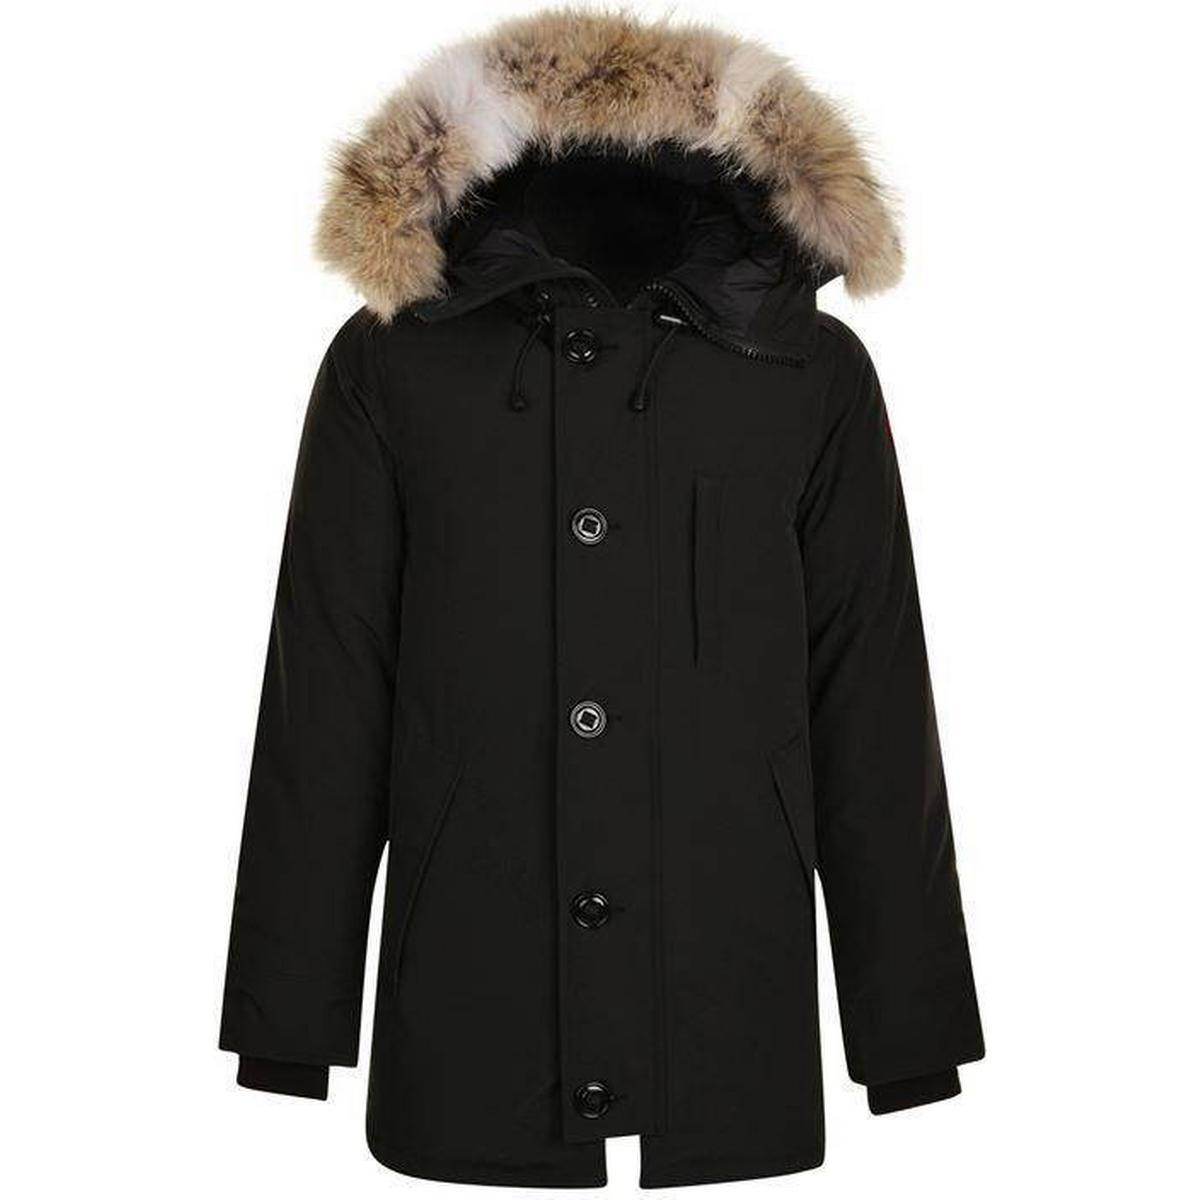 851b26731c8a Canada Goose Herrkläder - Jämför priser på PriceRunner